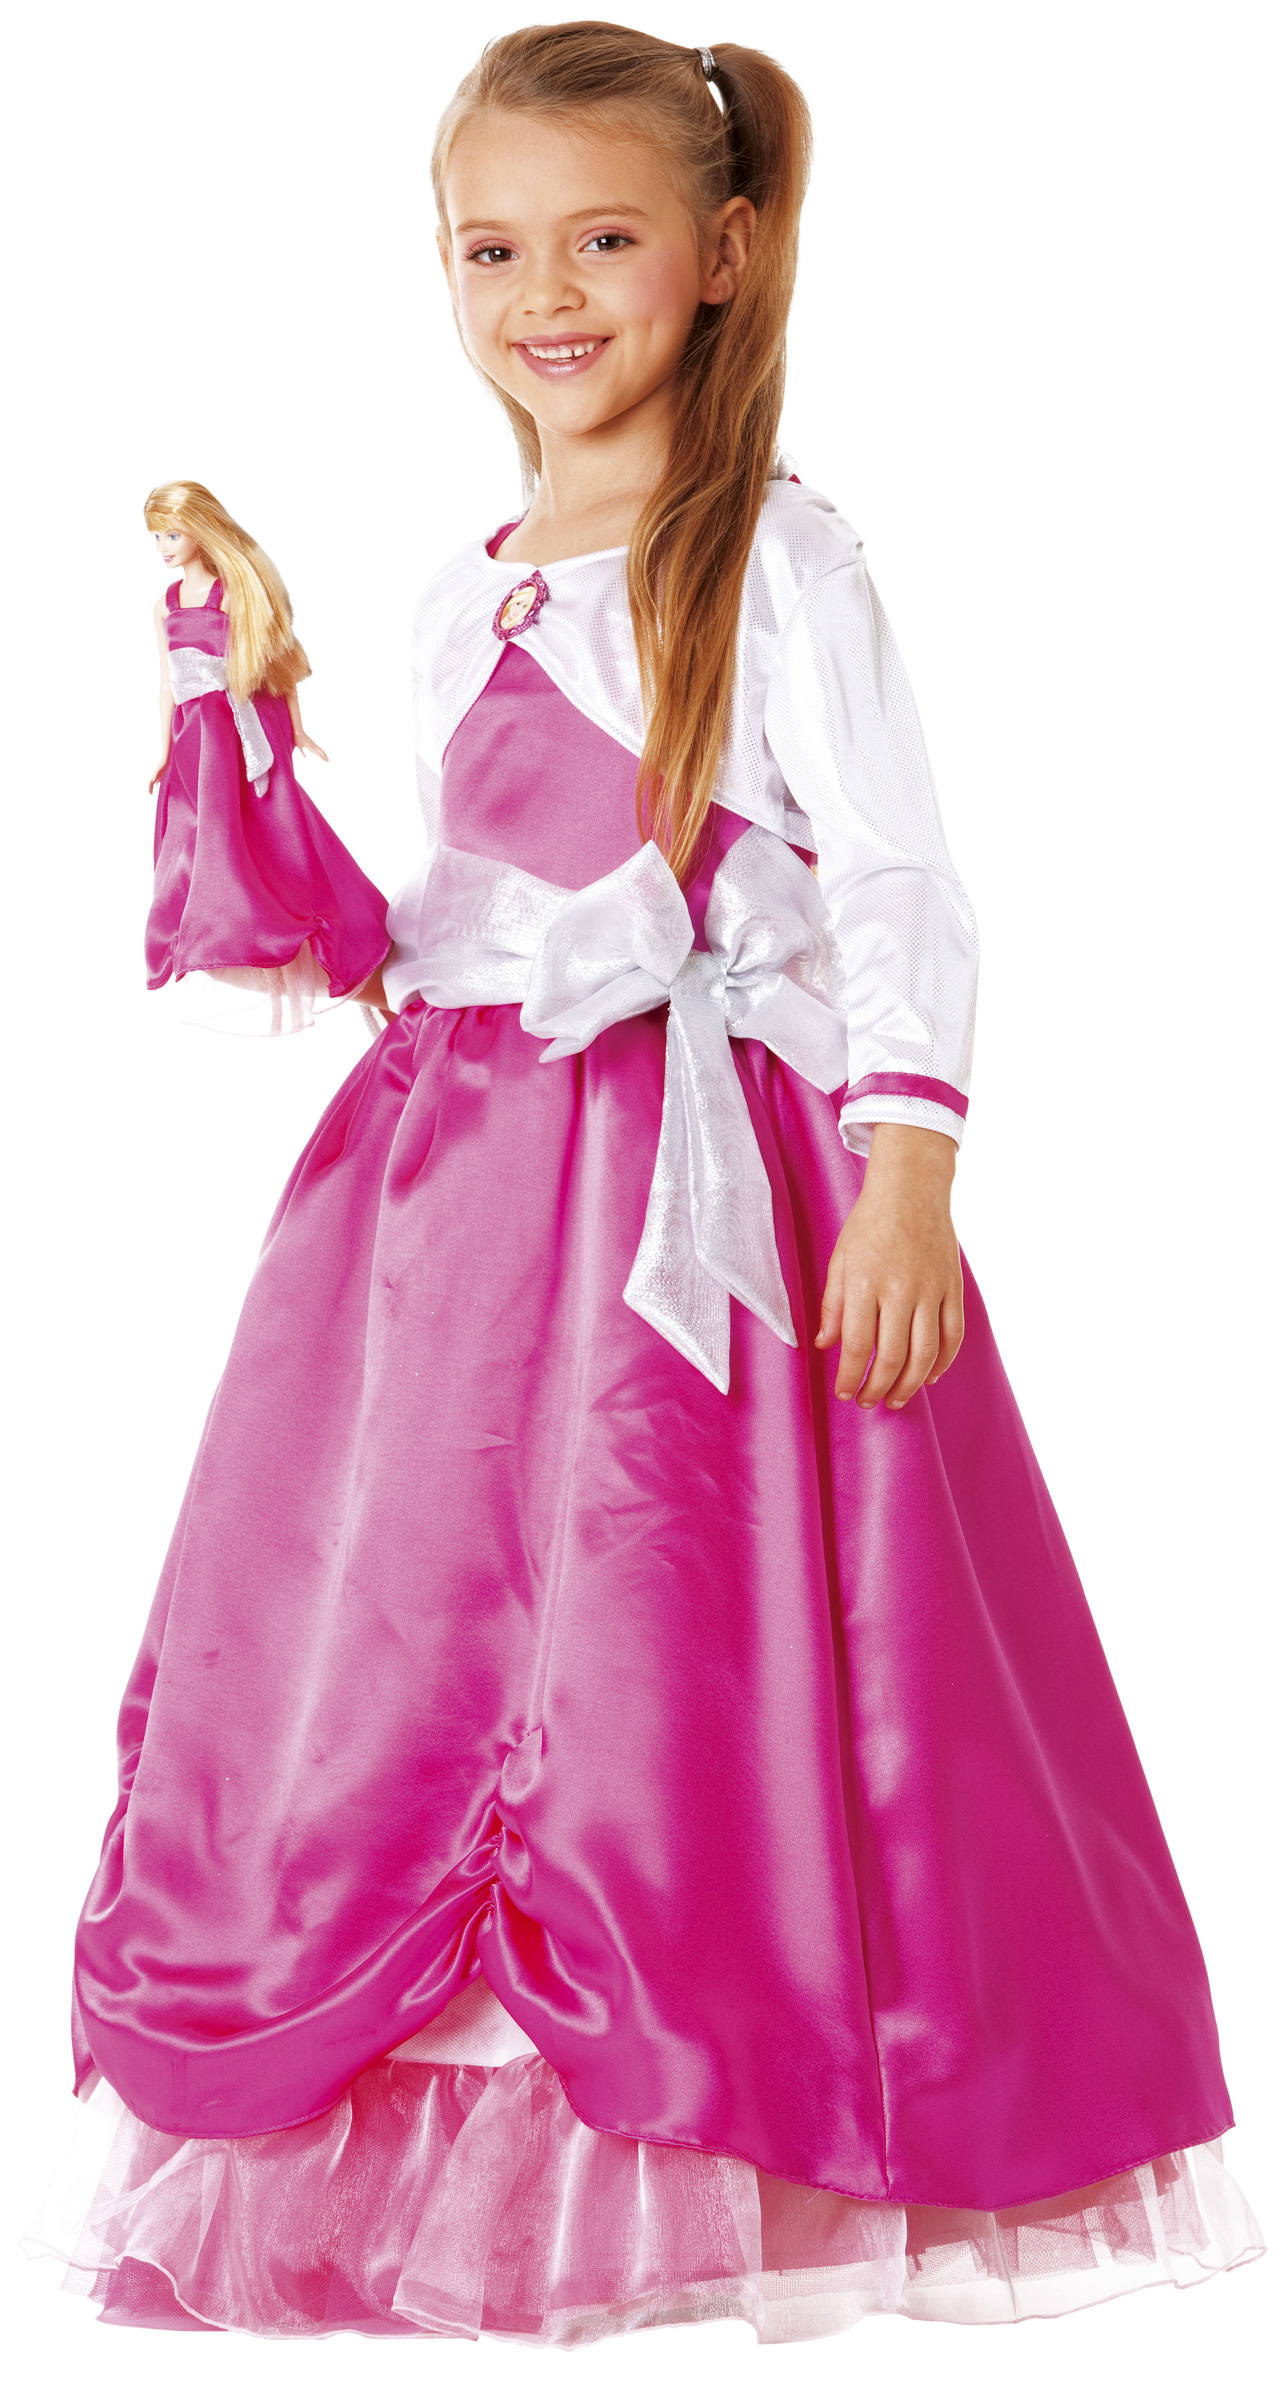 Officially licensed barbie princess dress - Barbie en princesse ...